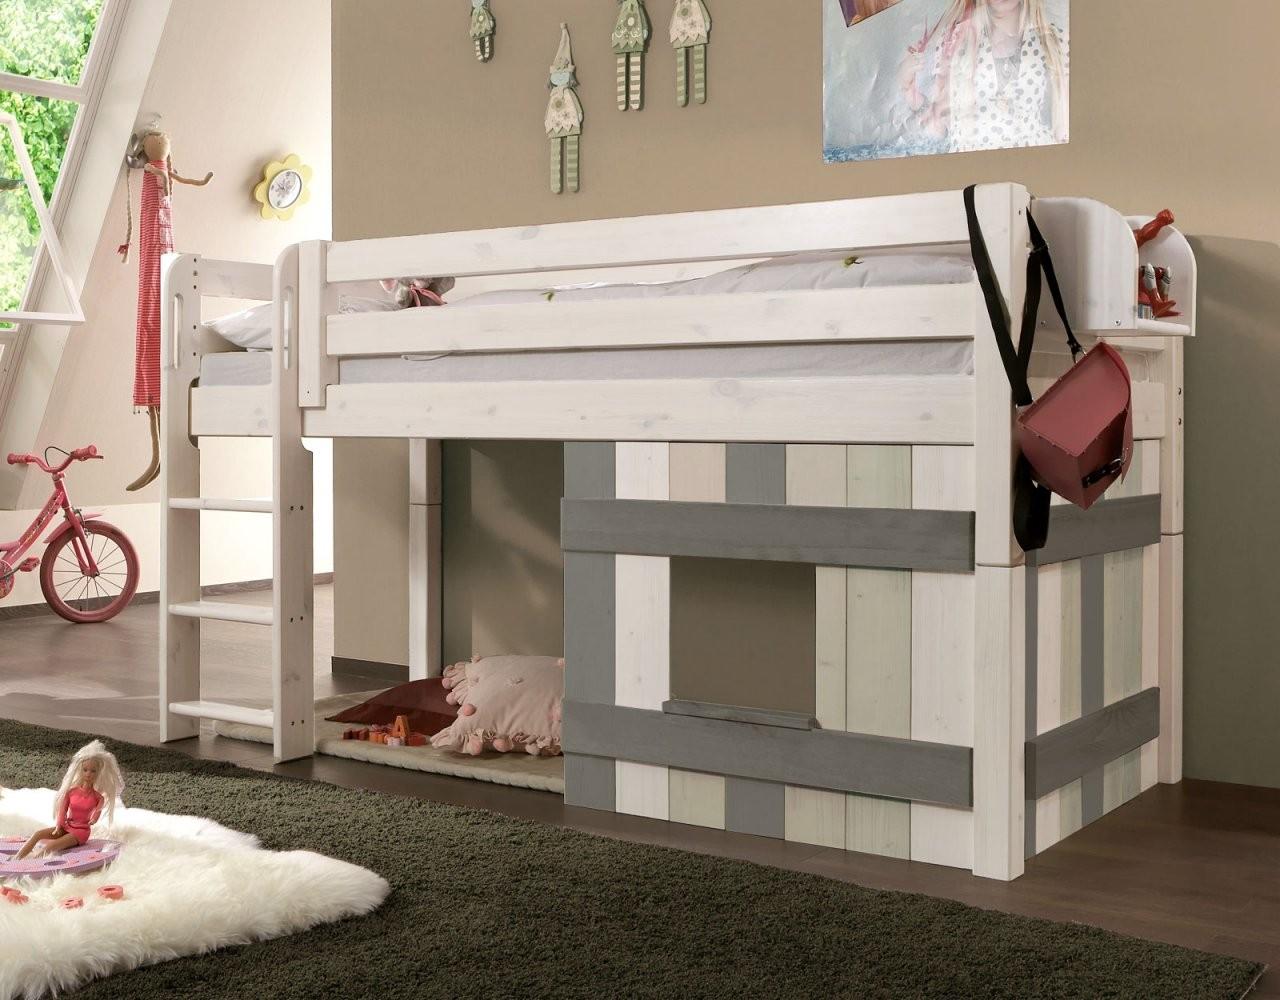 Kinderhochbett  Kinderhochbetten Günstig Kaufen  Betten von Kinderhochbett Mit Rutsche Günstig Kaufen Bild